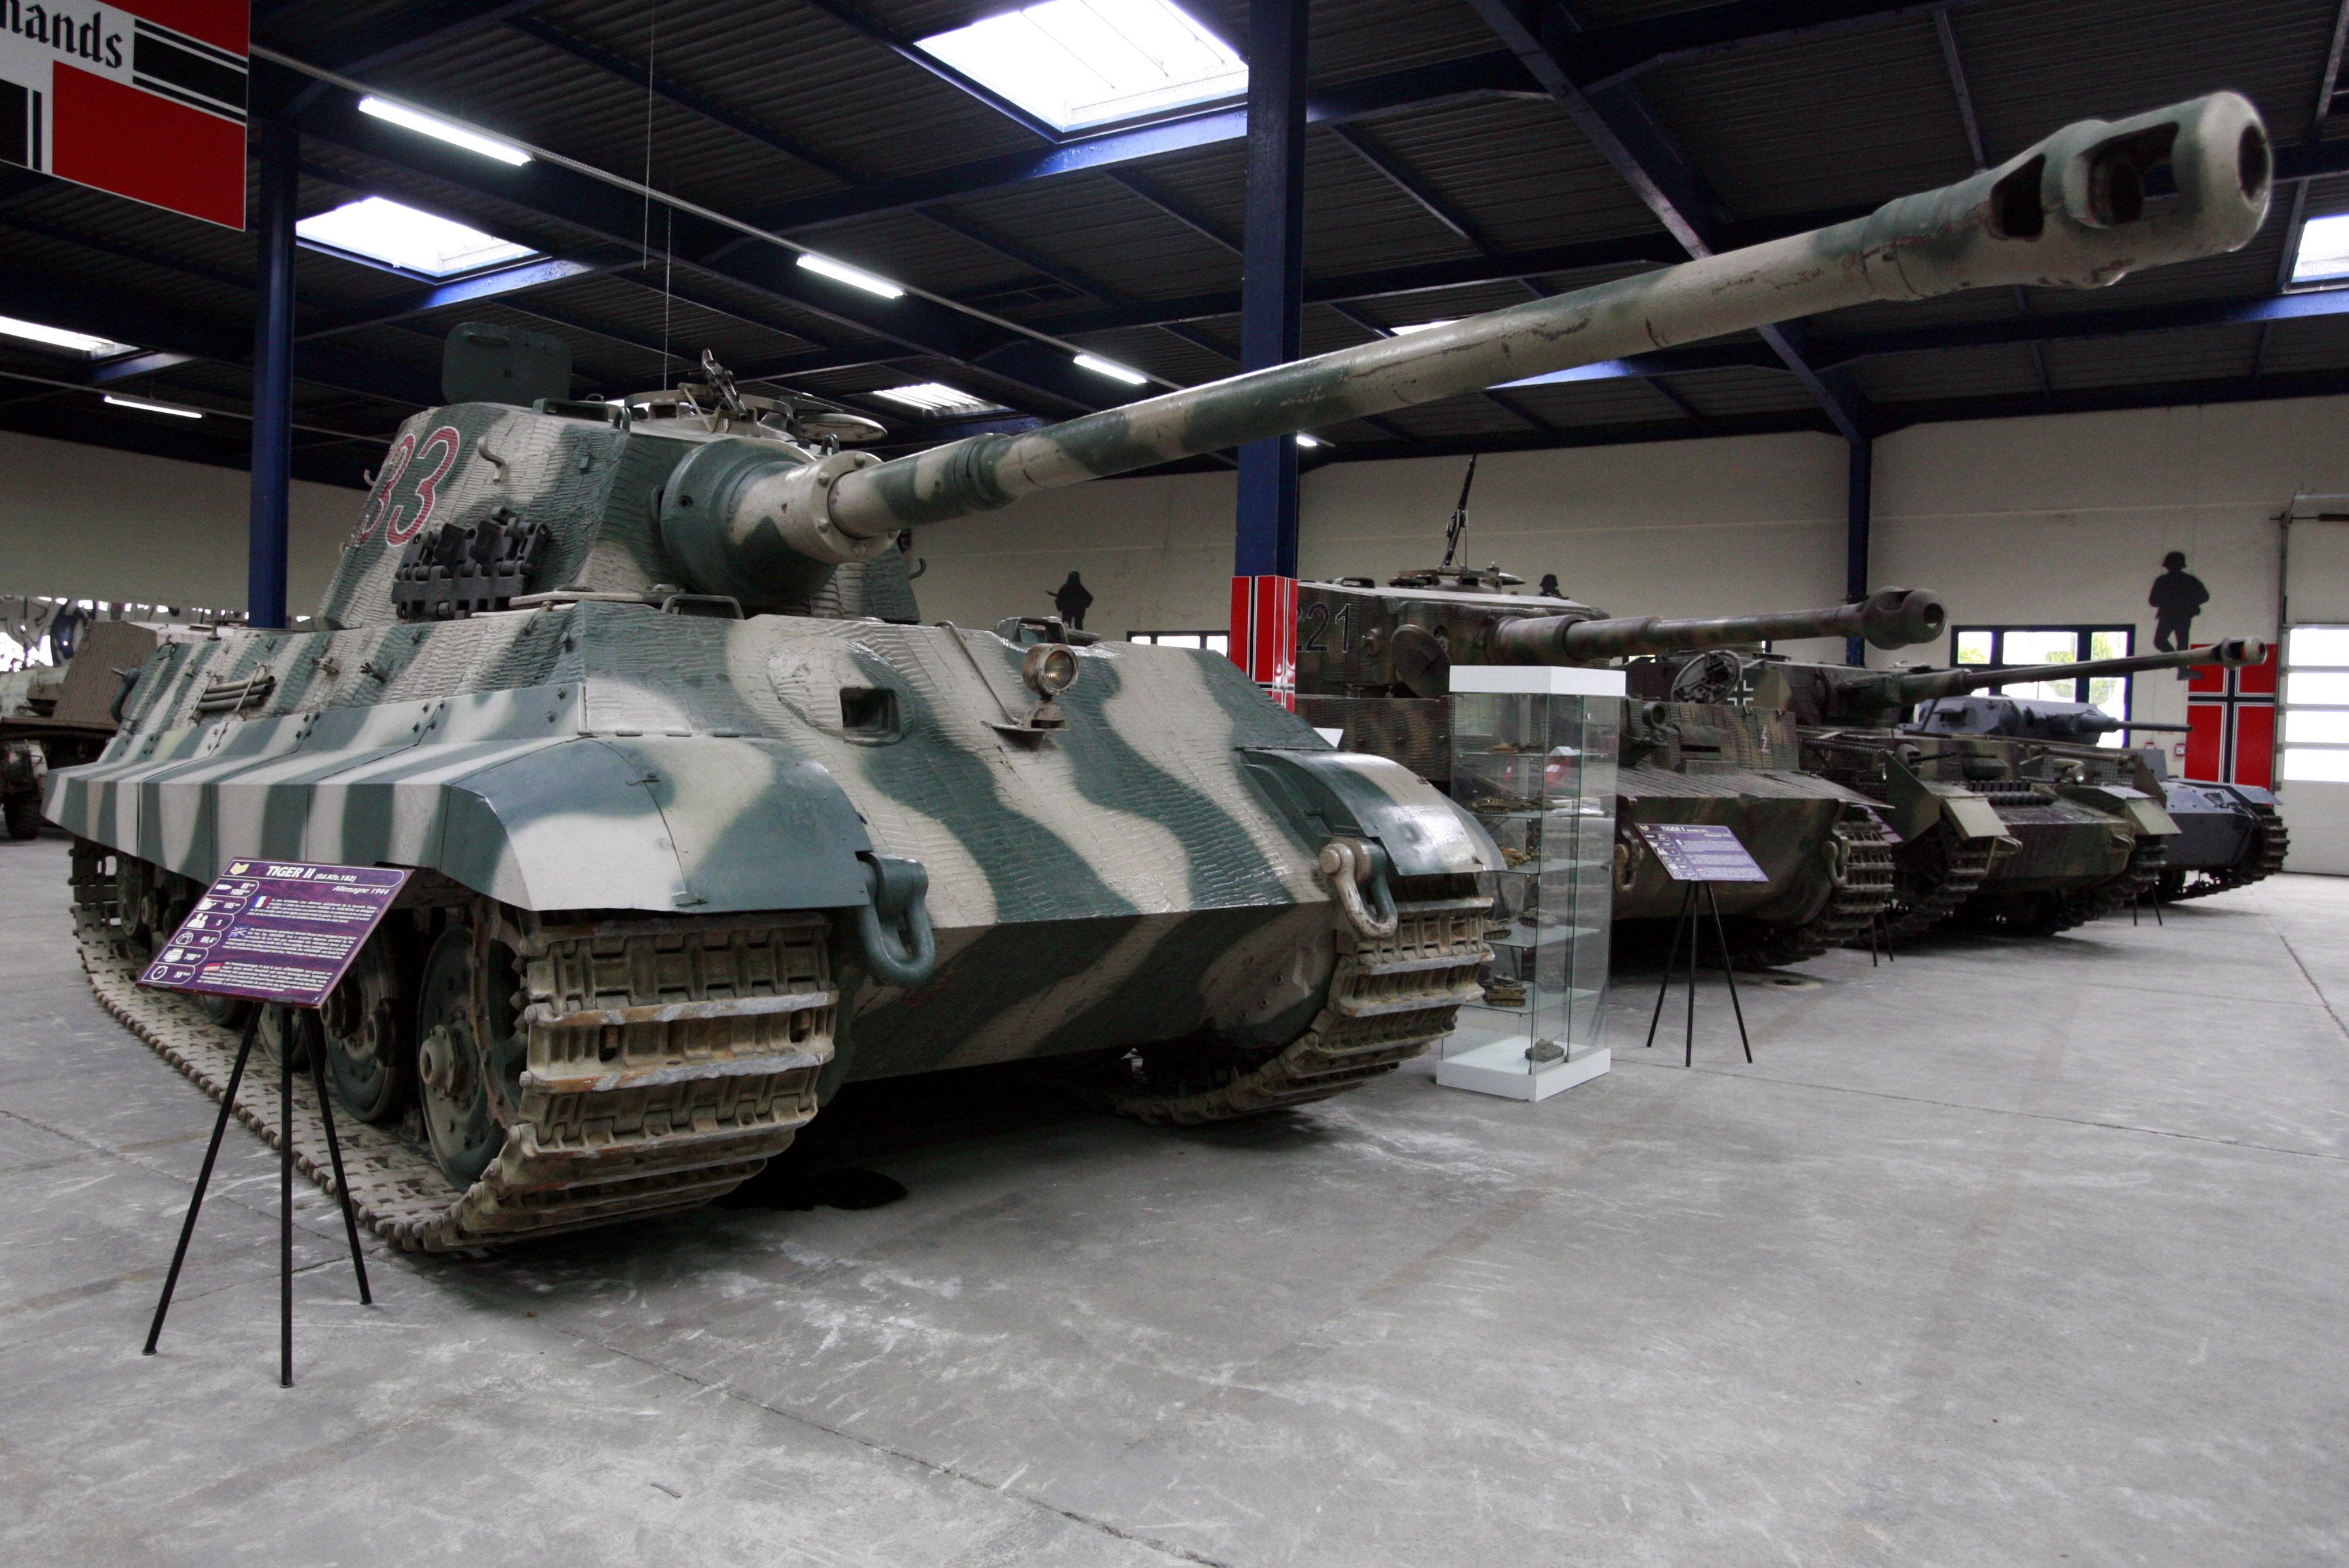 Panzerkampfwagen VI Tiger II – Wikipedia